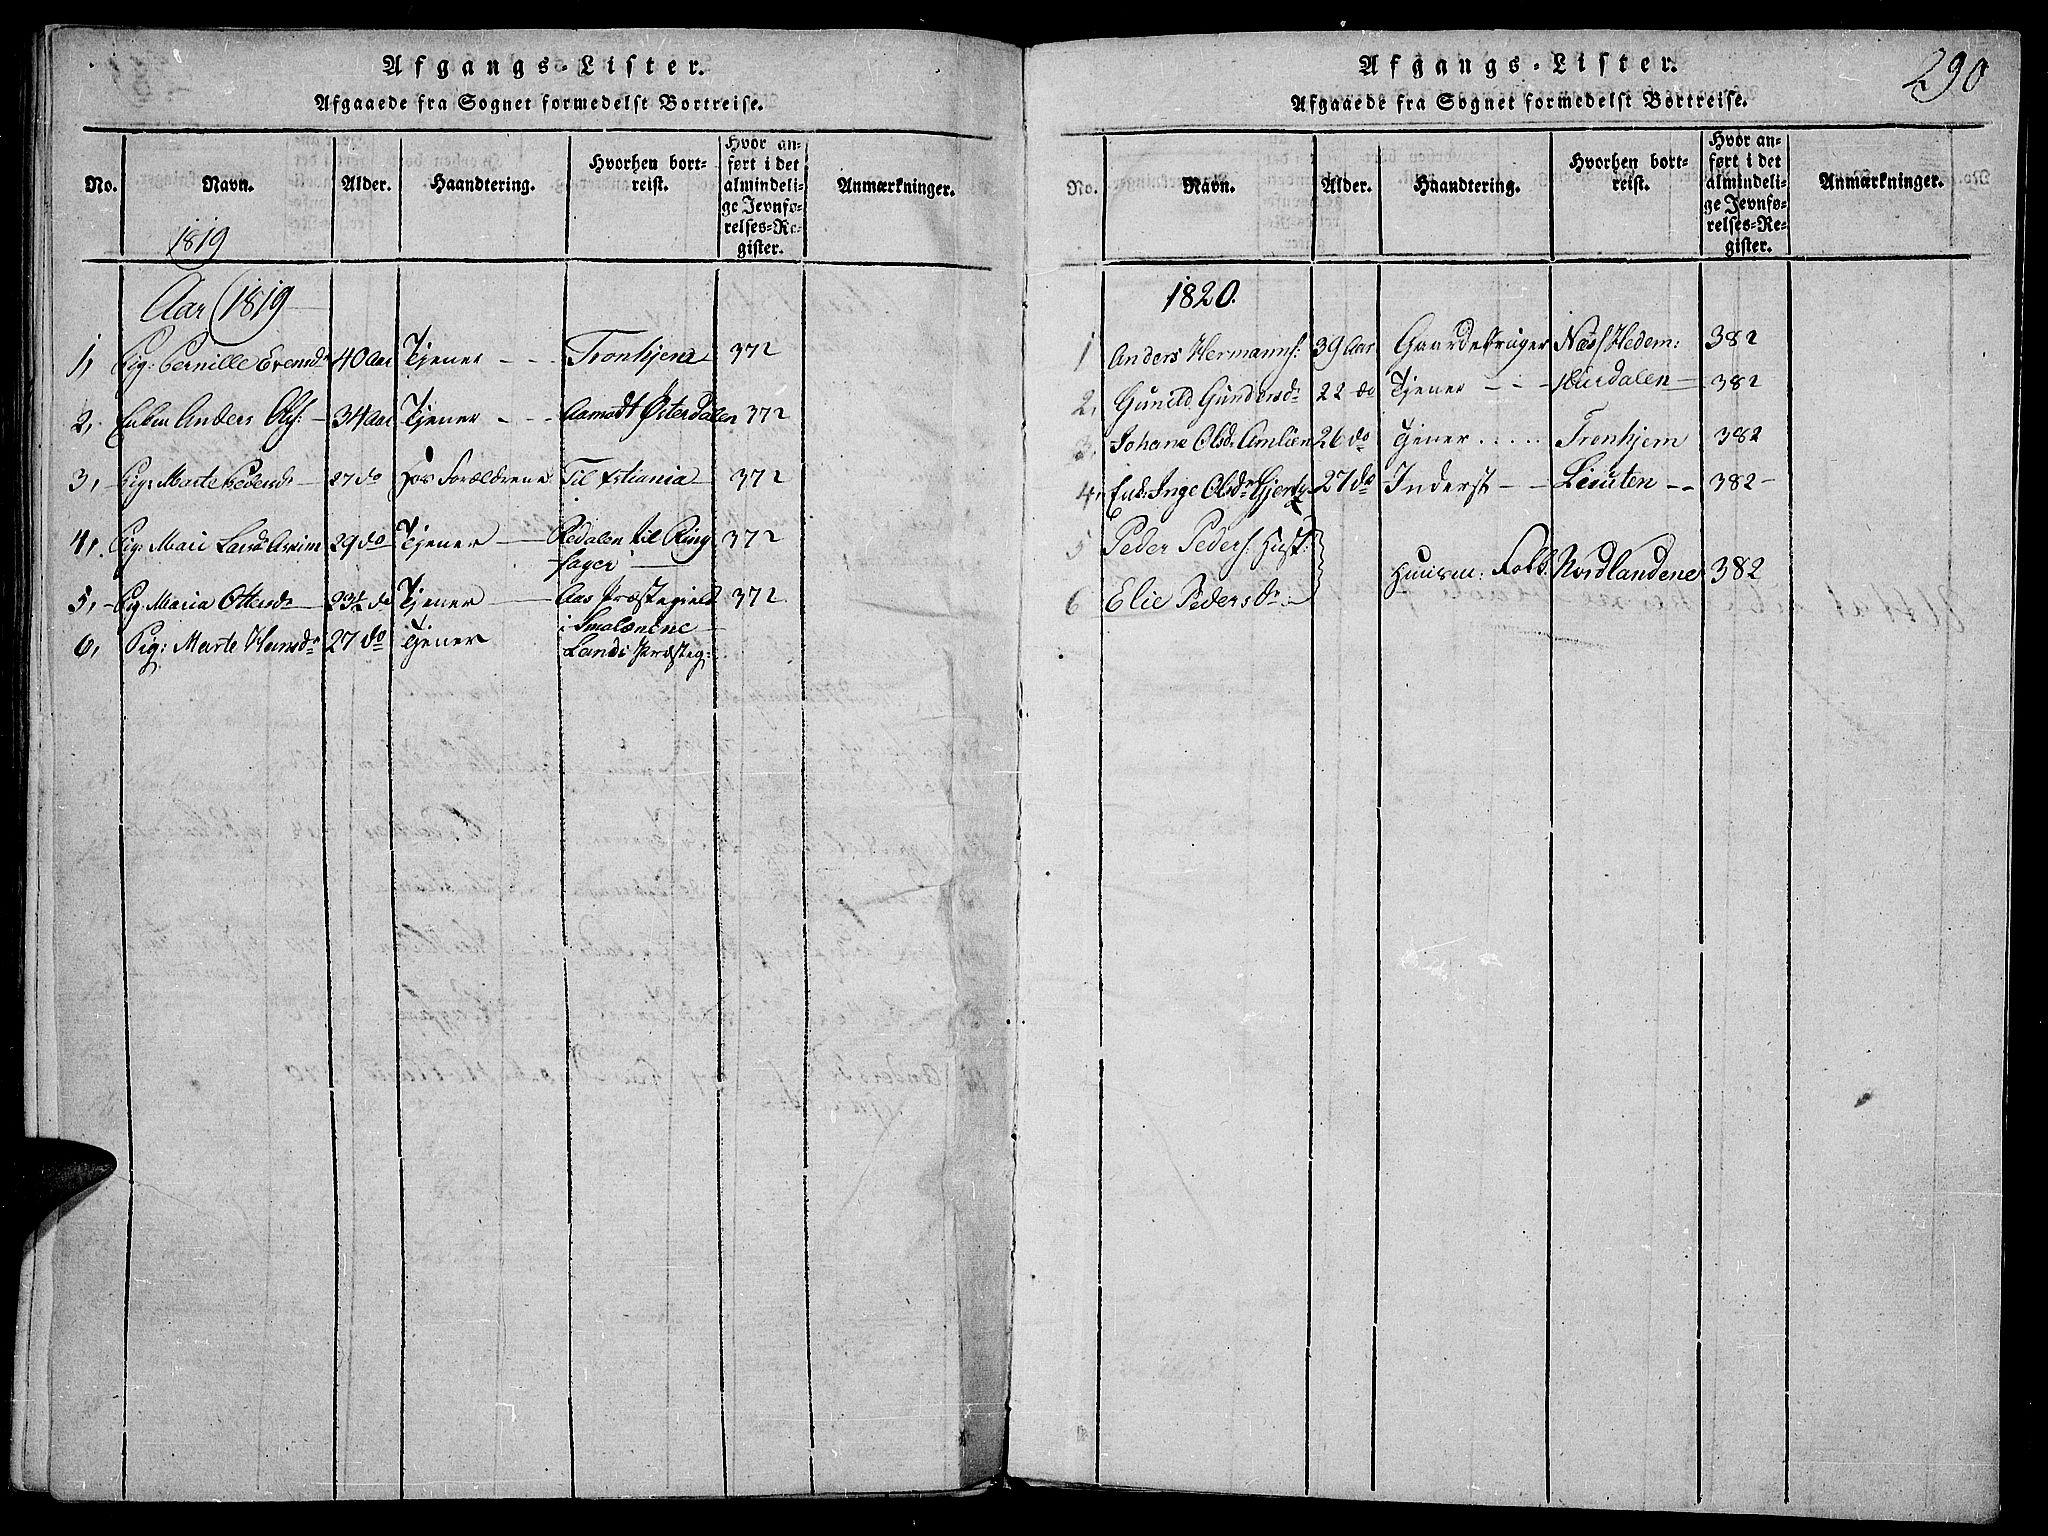 SAH, Toten prestekontor, Ministerialbok nr. 9, 1814-1820, s. 290